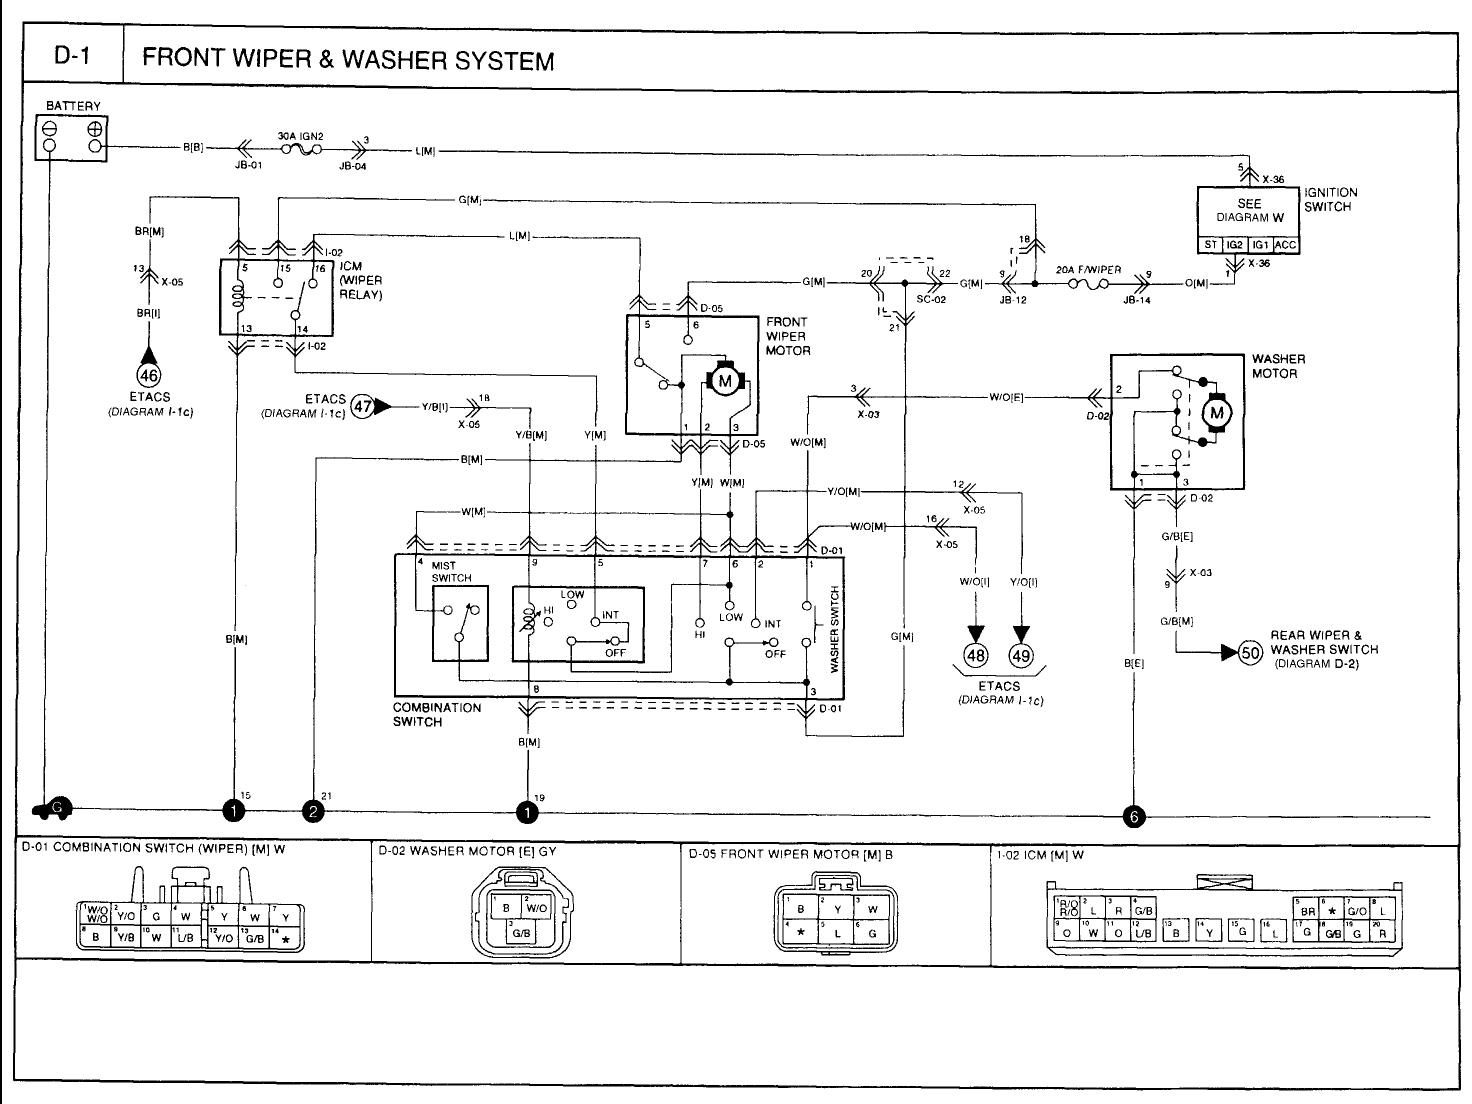 2014 Kia Sorento Wiring Diagrams Fuse Box Layout Peugeot 406 Hdi Fusebox Yenpancane Jeanjaures37 Fr